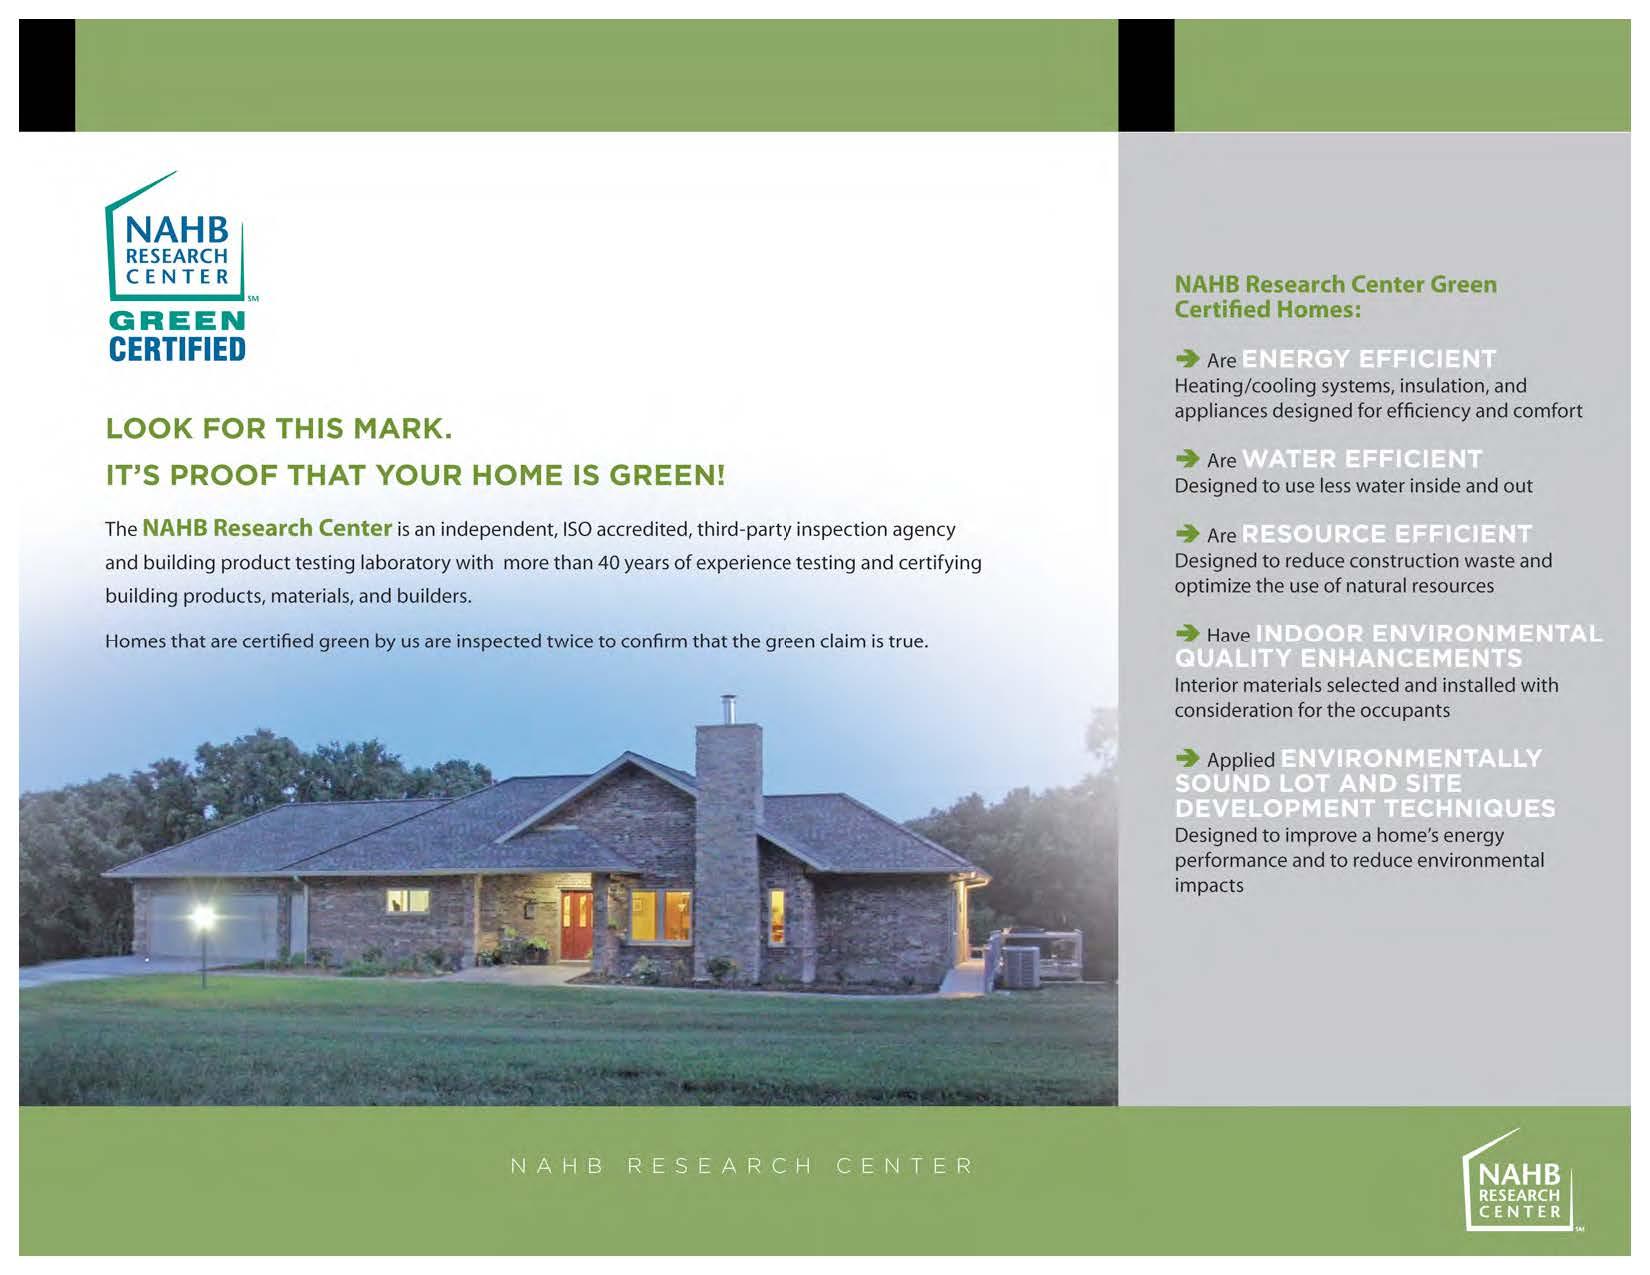 BeGreen_BuyGreen_CertifiedGreen_Page_2.jpg